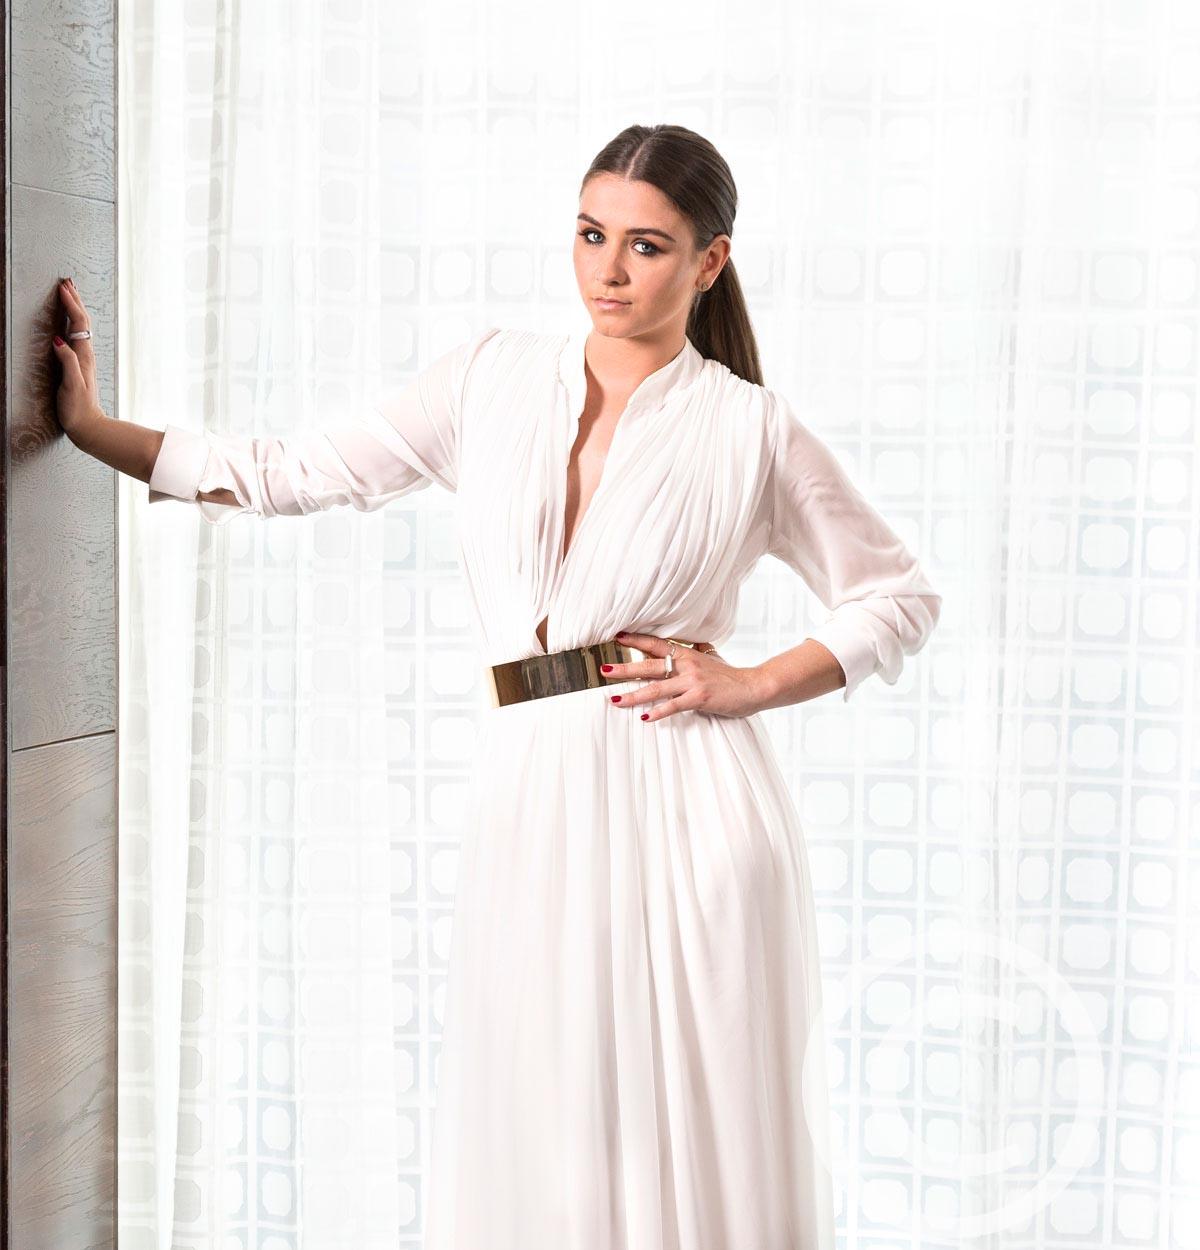 _brookvincent-celebrity-photography-manchester-fashion-smag-editorial-magazine-9313